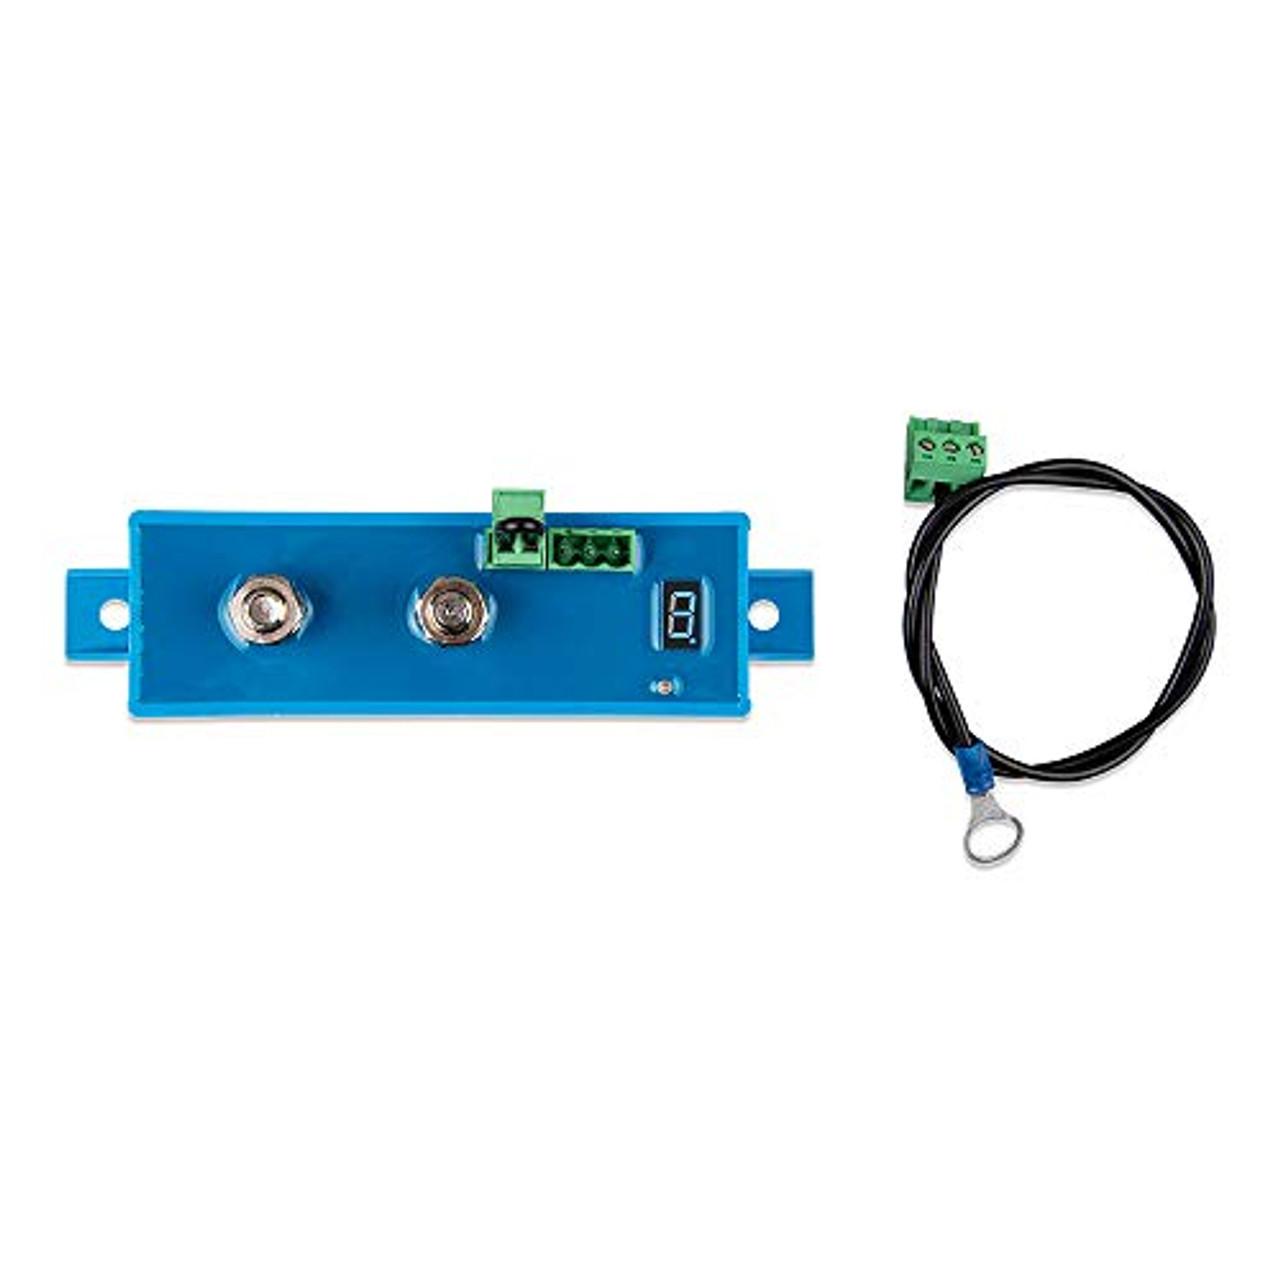 Victron Smart BatteryProtect - 65AMP - 6-35 VDC - Bluetooth Ca. [BPR065022000]